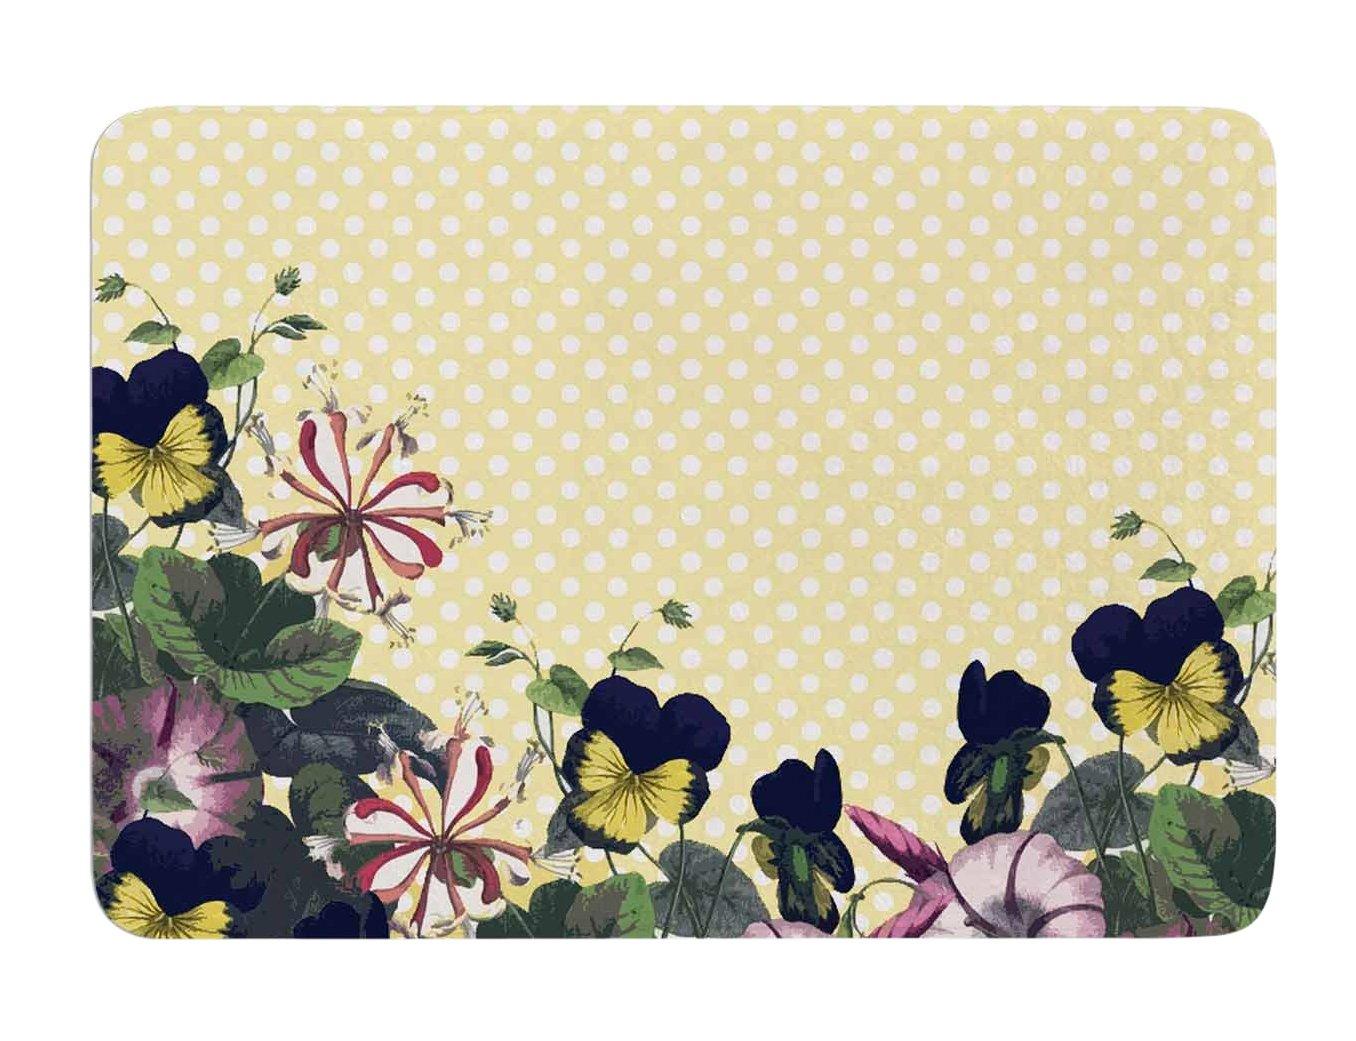 Kess InHouse Alison Coxon Polka Dot Purple Yellow Memory Foam Bath Mat 24 by 36-Inch 24 X 36